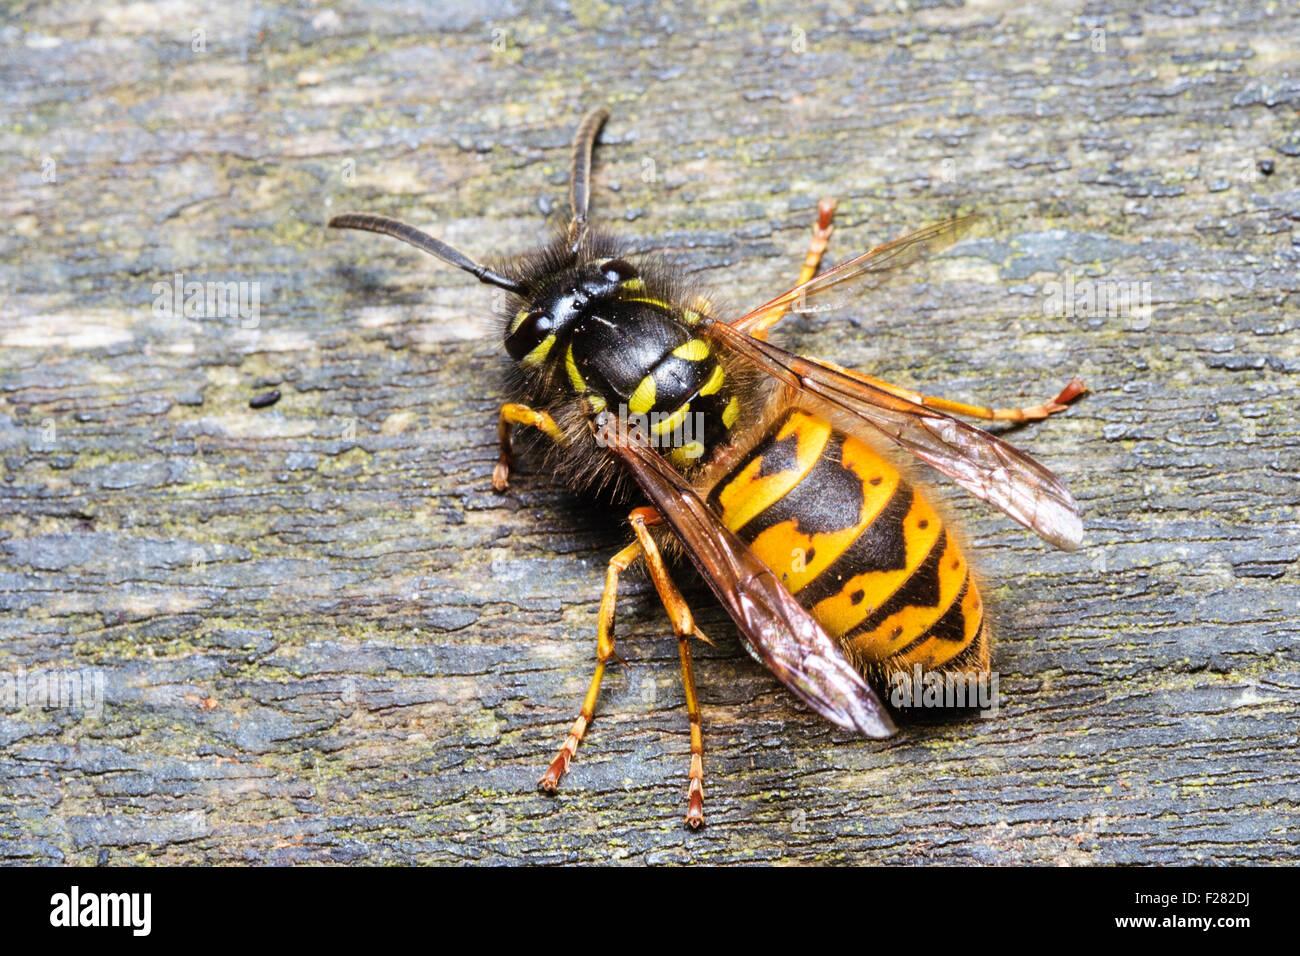 Insect. Bee, wasp. Yellow jacket common wasp, 'vespula vulgaris' sitting on wood. Macro close-up. Top-down - Stock Image